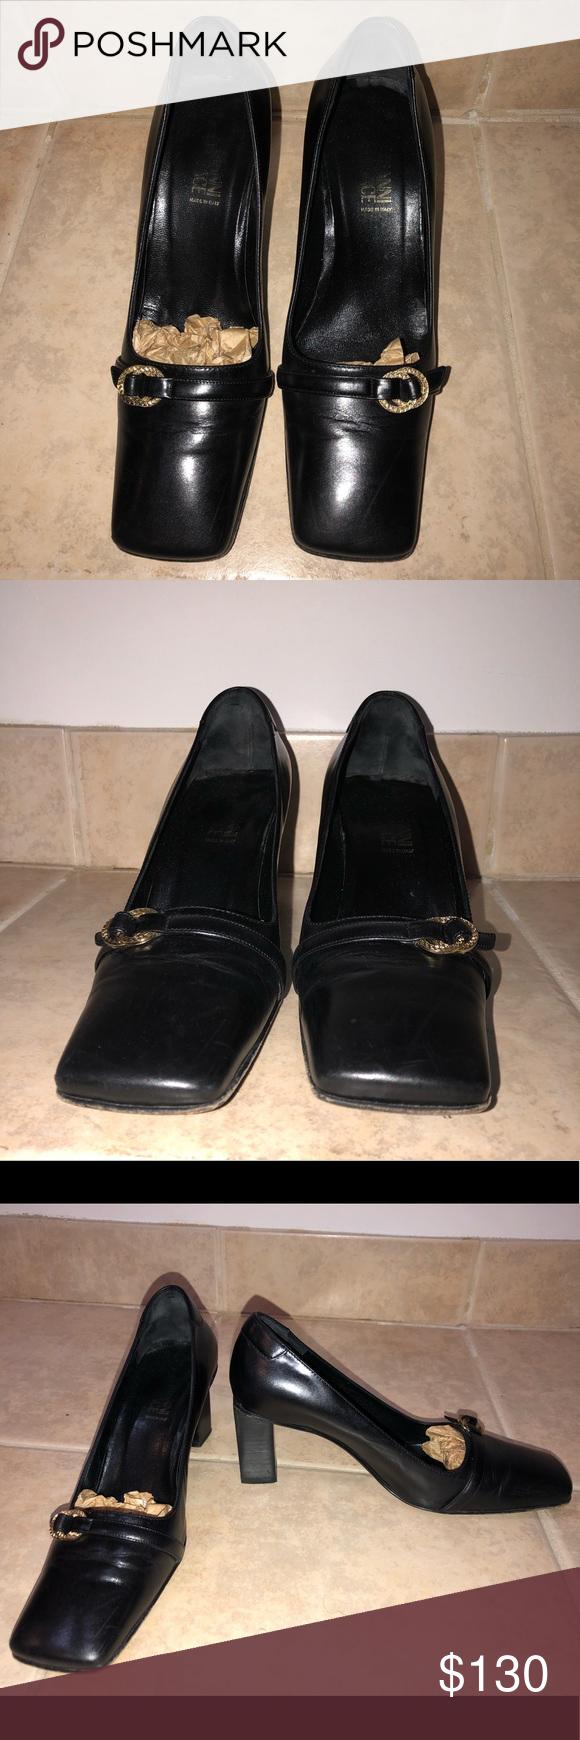 Vintage Gianni Versace Vero Cuoio Square Toe Heels Versace Shoes Versace Heels Square Toe Heels